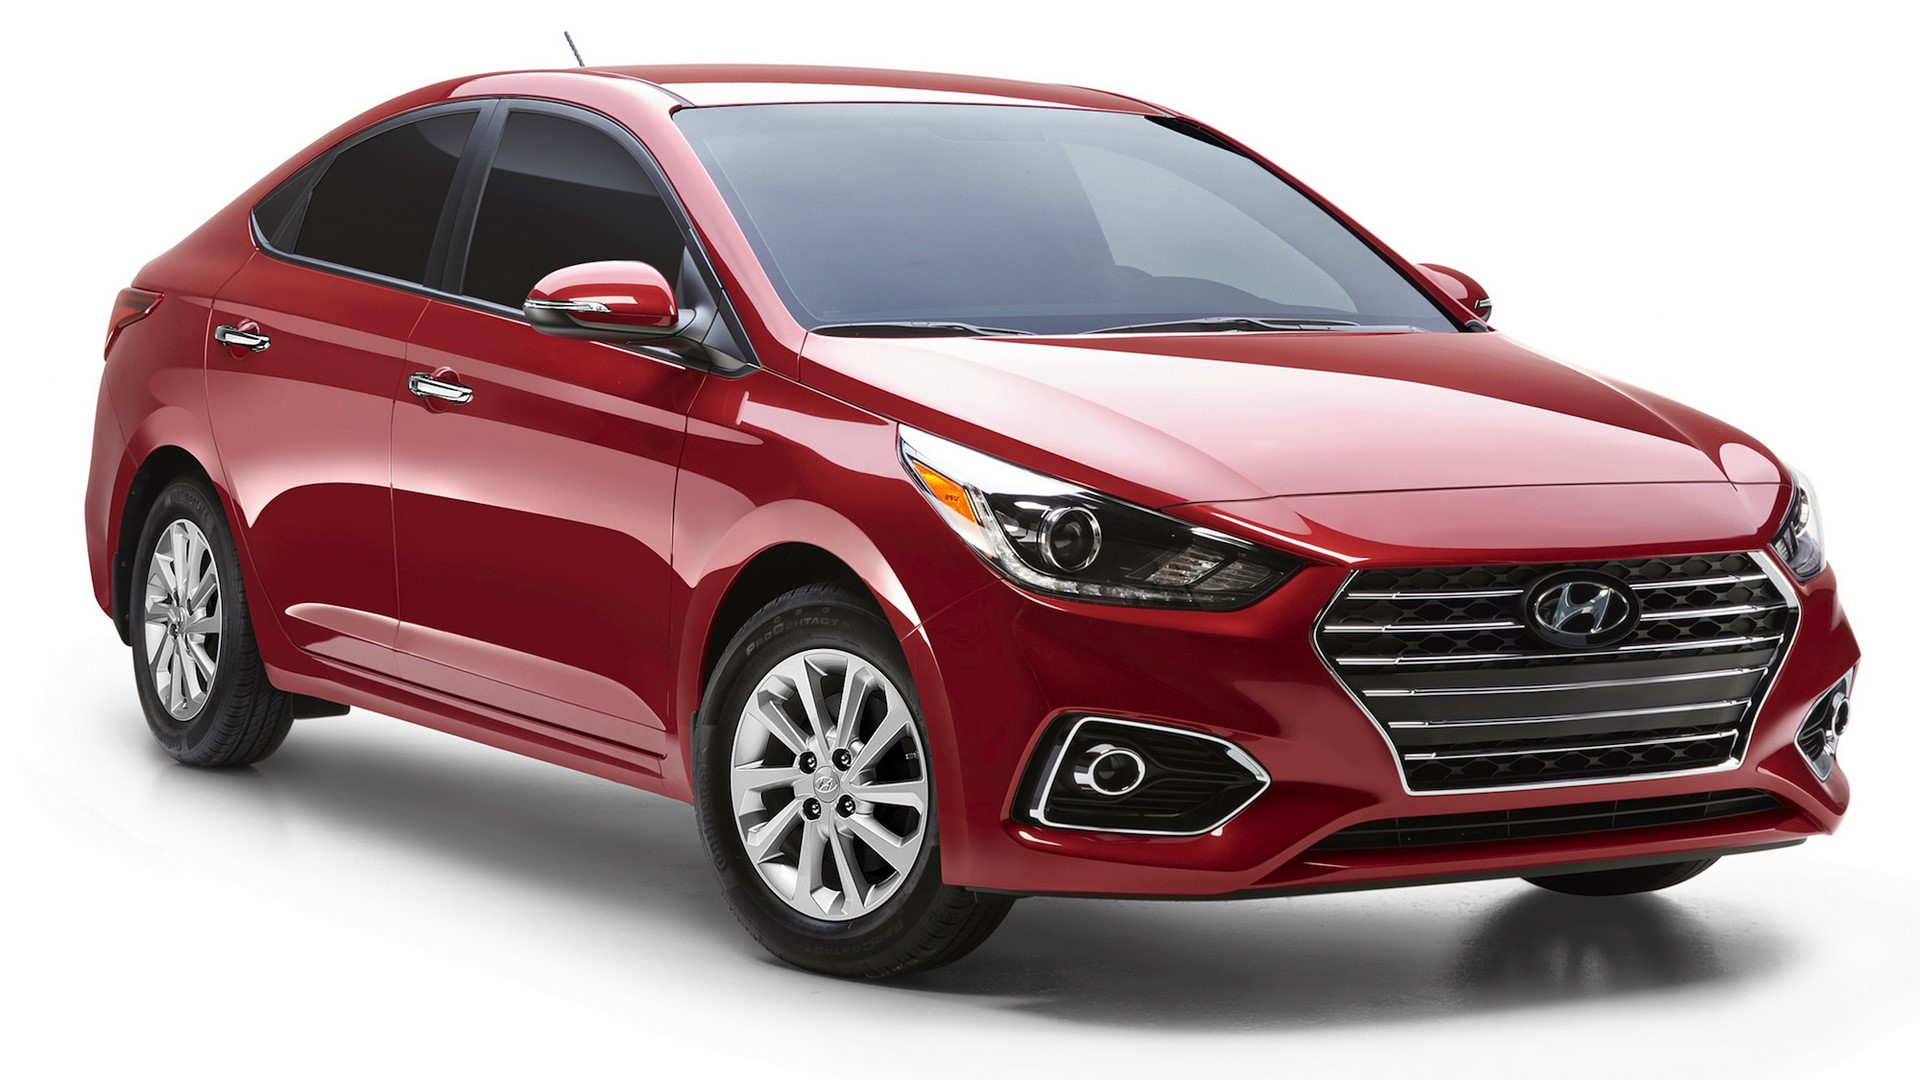 2018 Hyundai Accent (1)